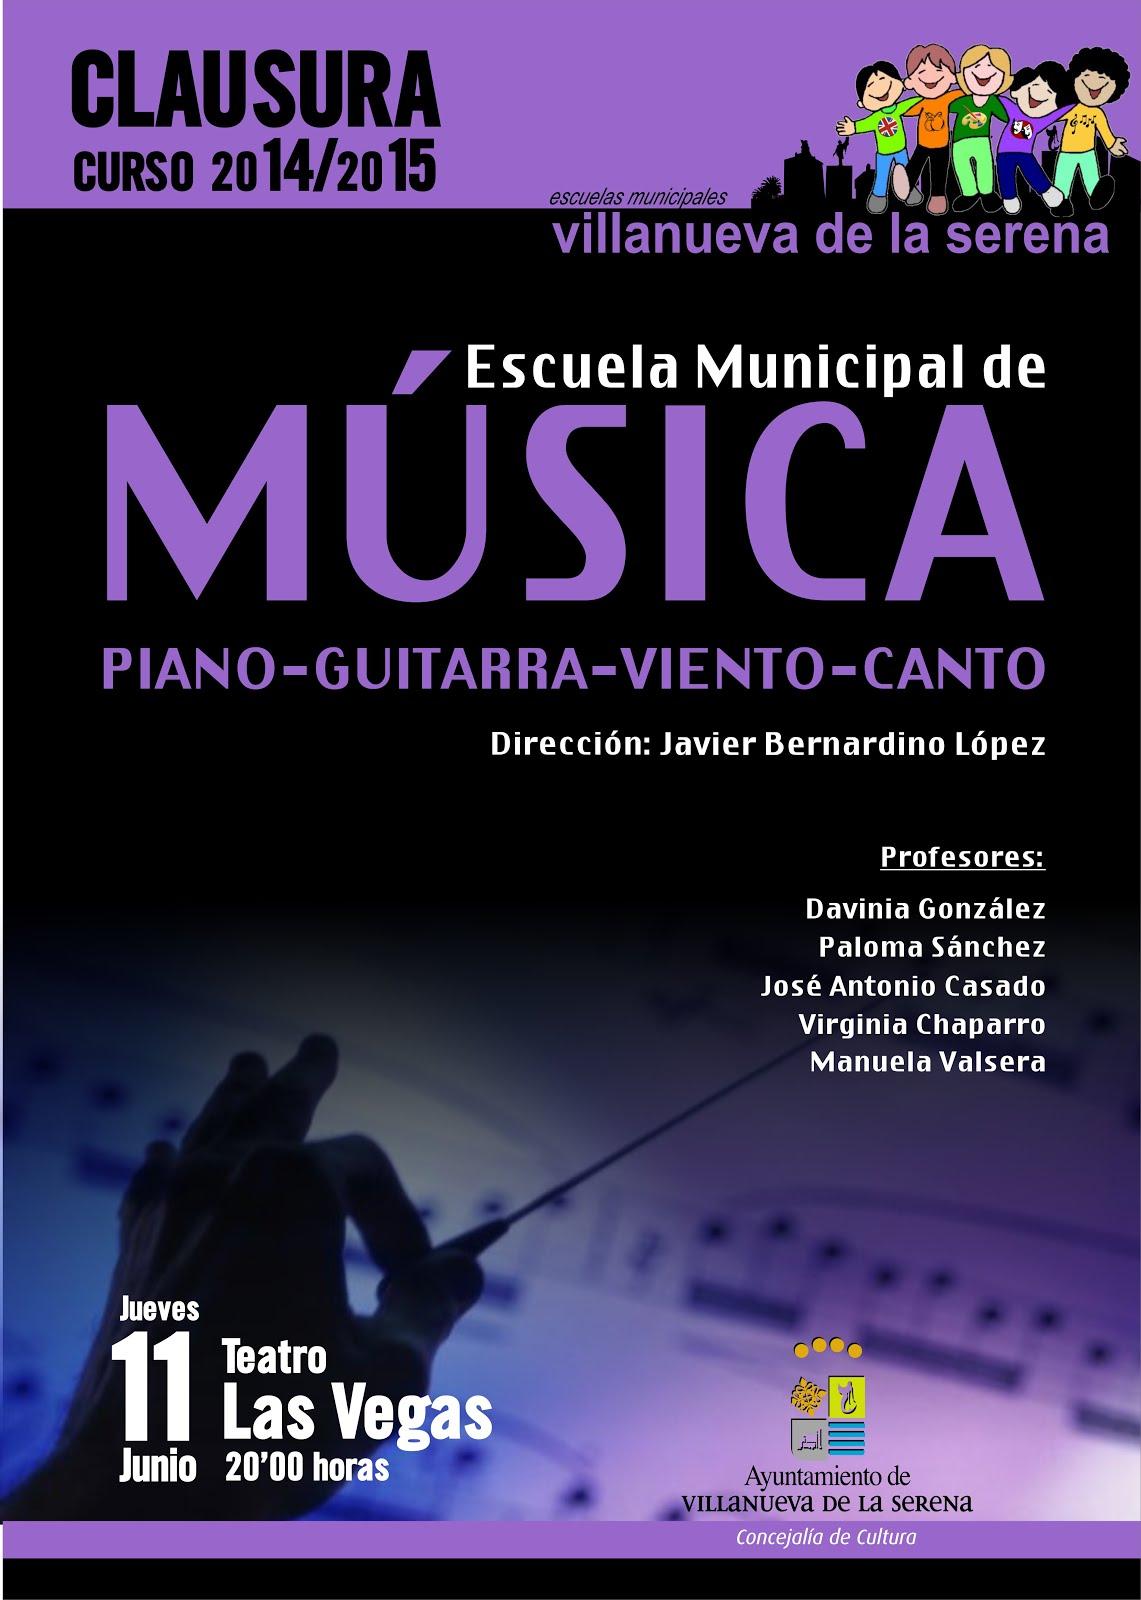 Clausura Escuela de Música Municipal